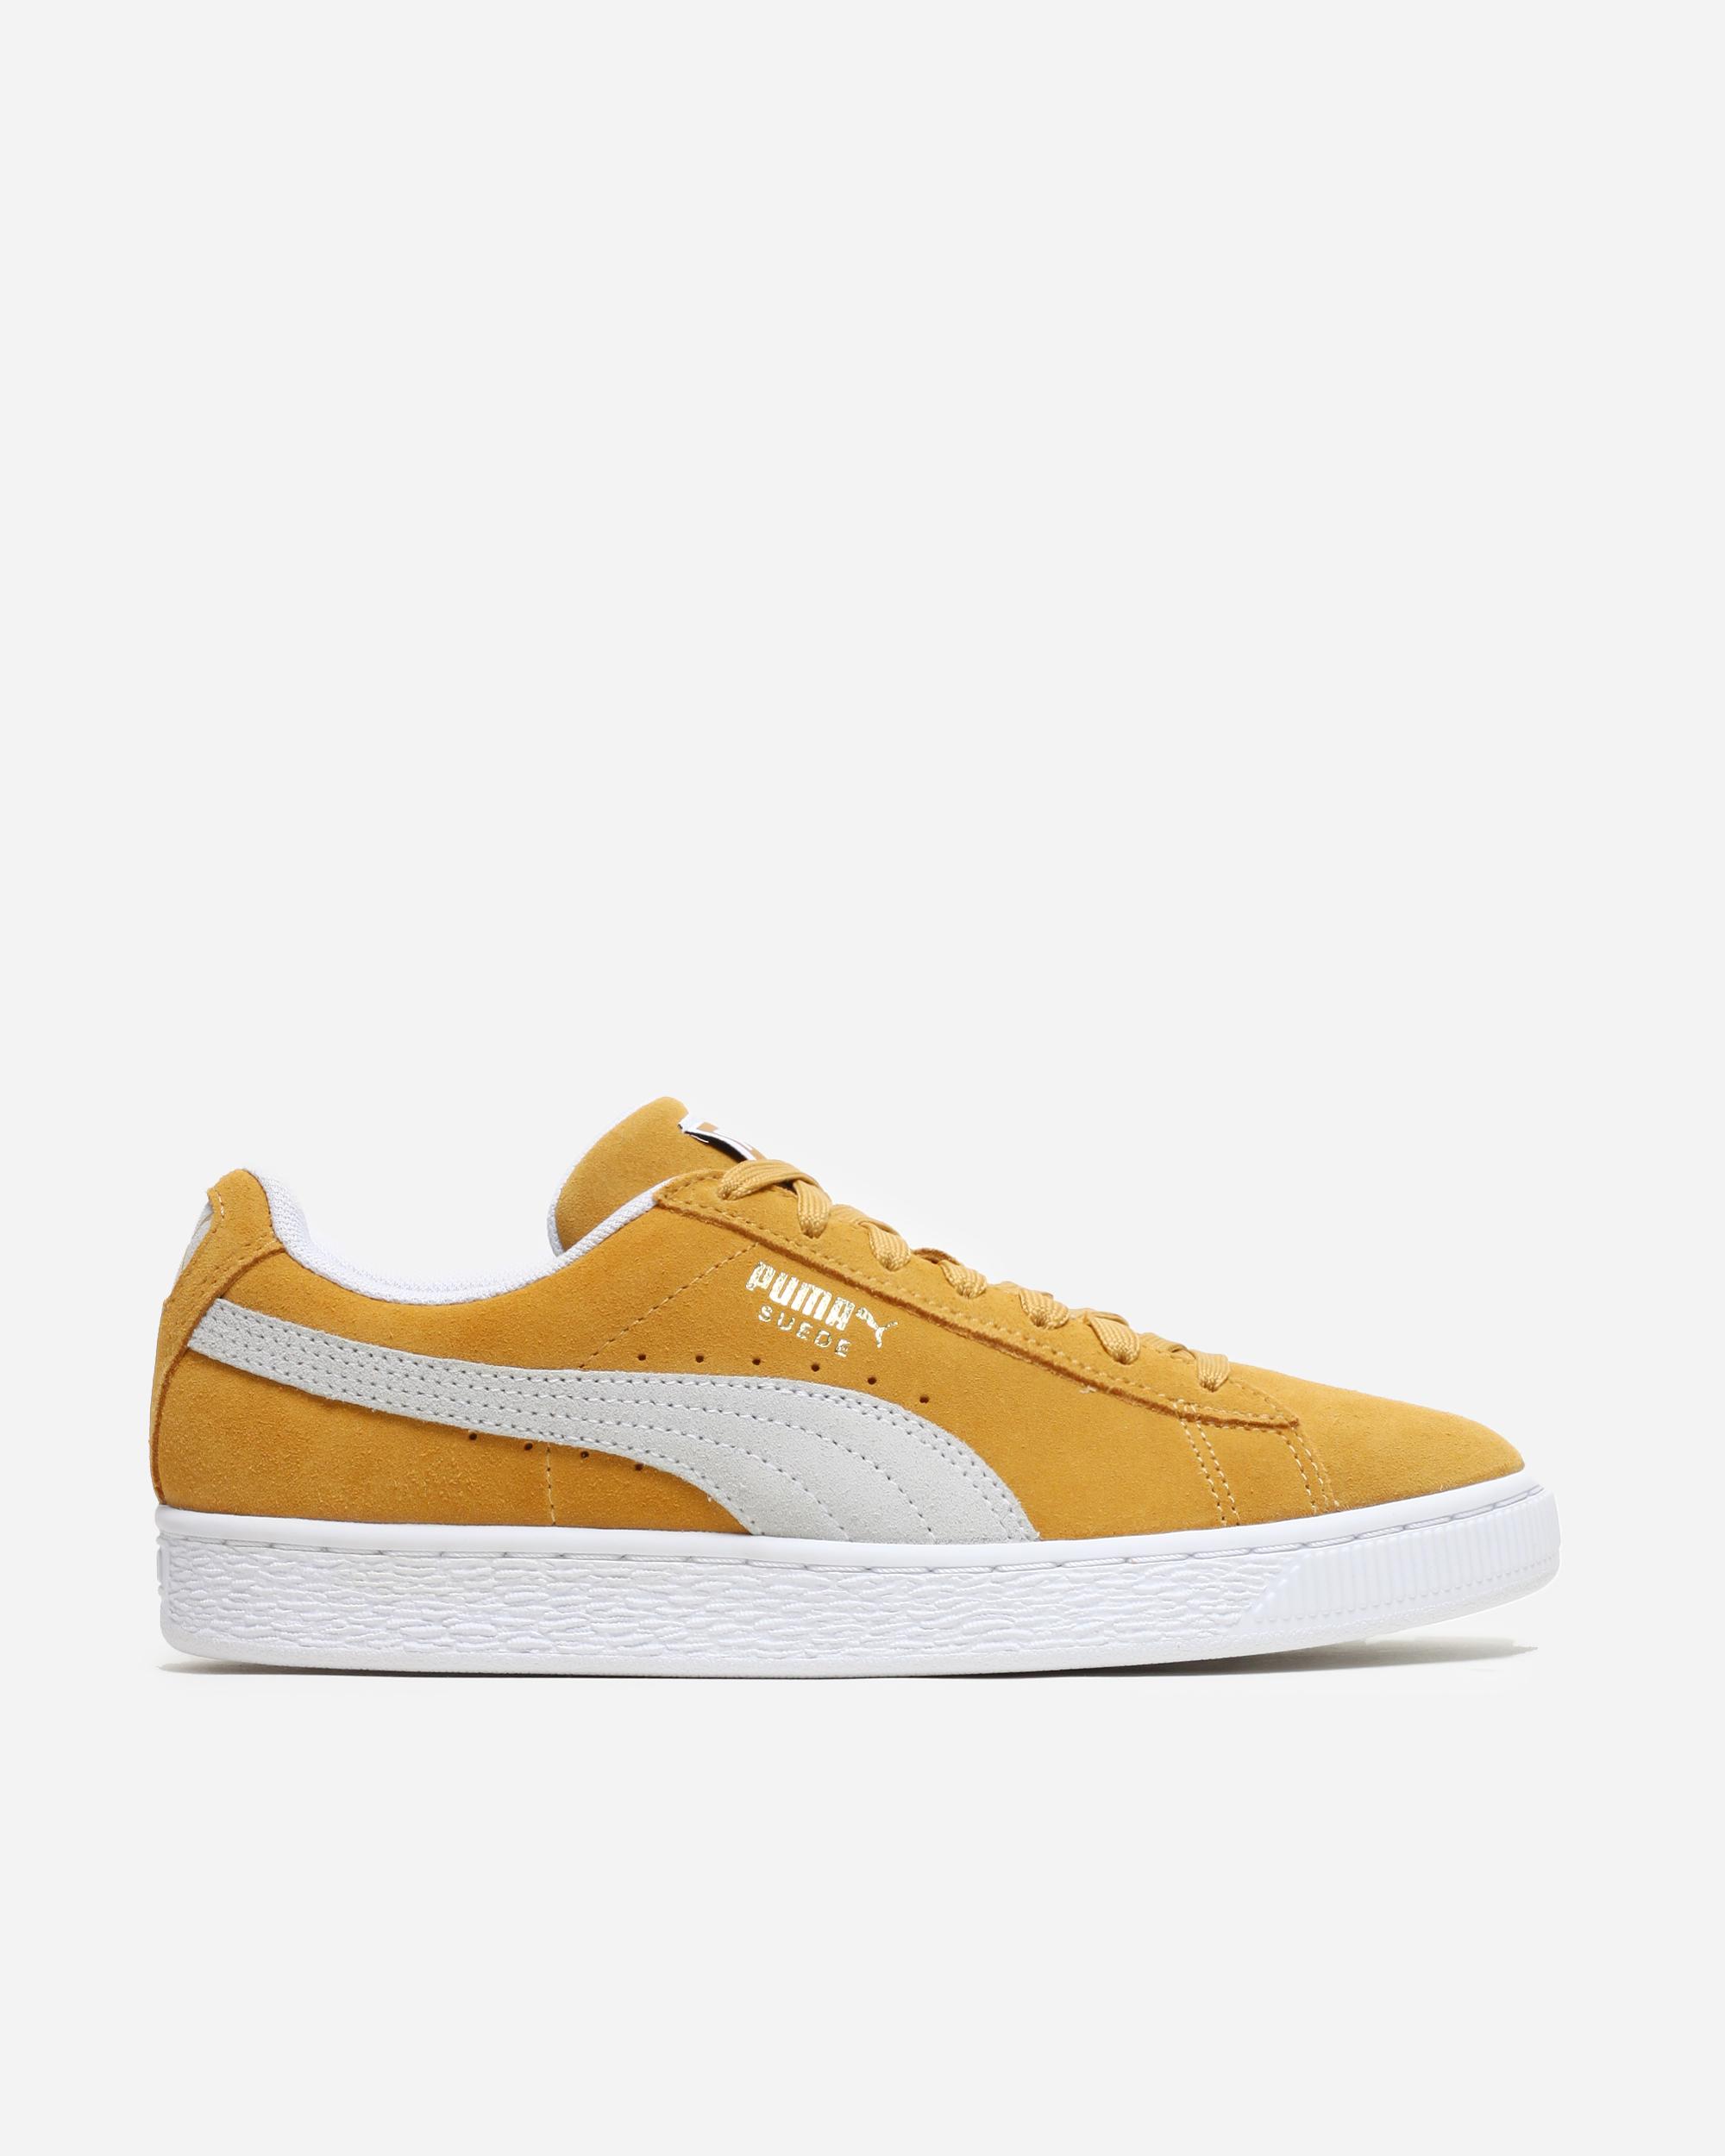 Puma Suede Classic Honey Mustard/White